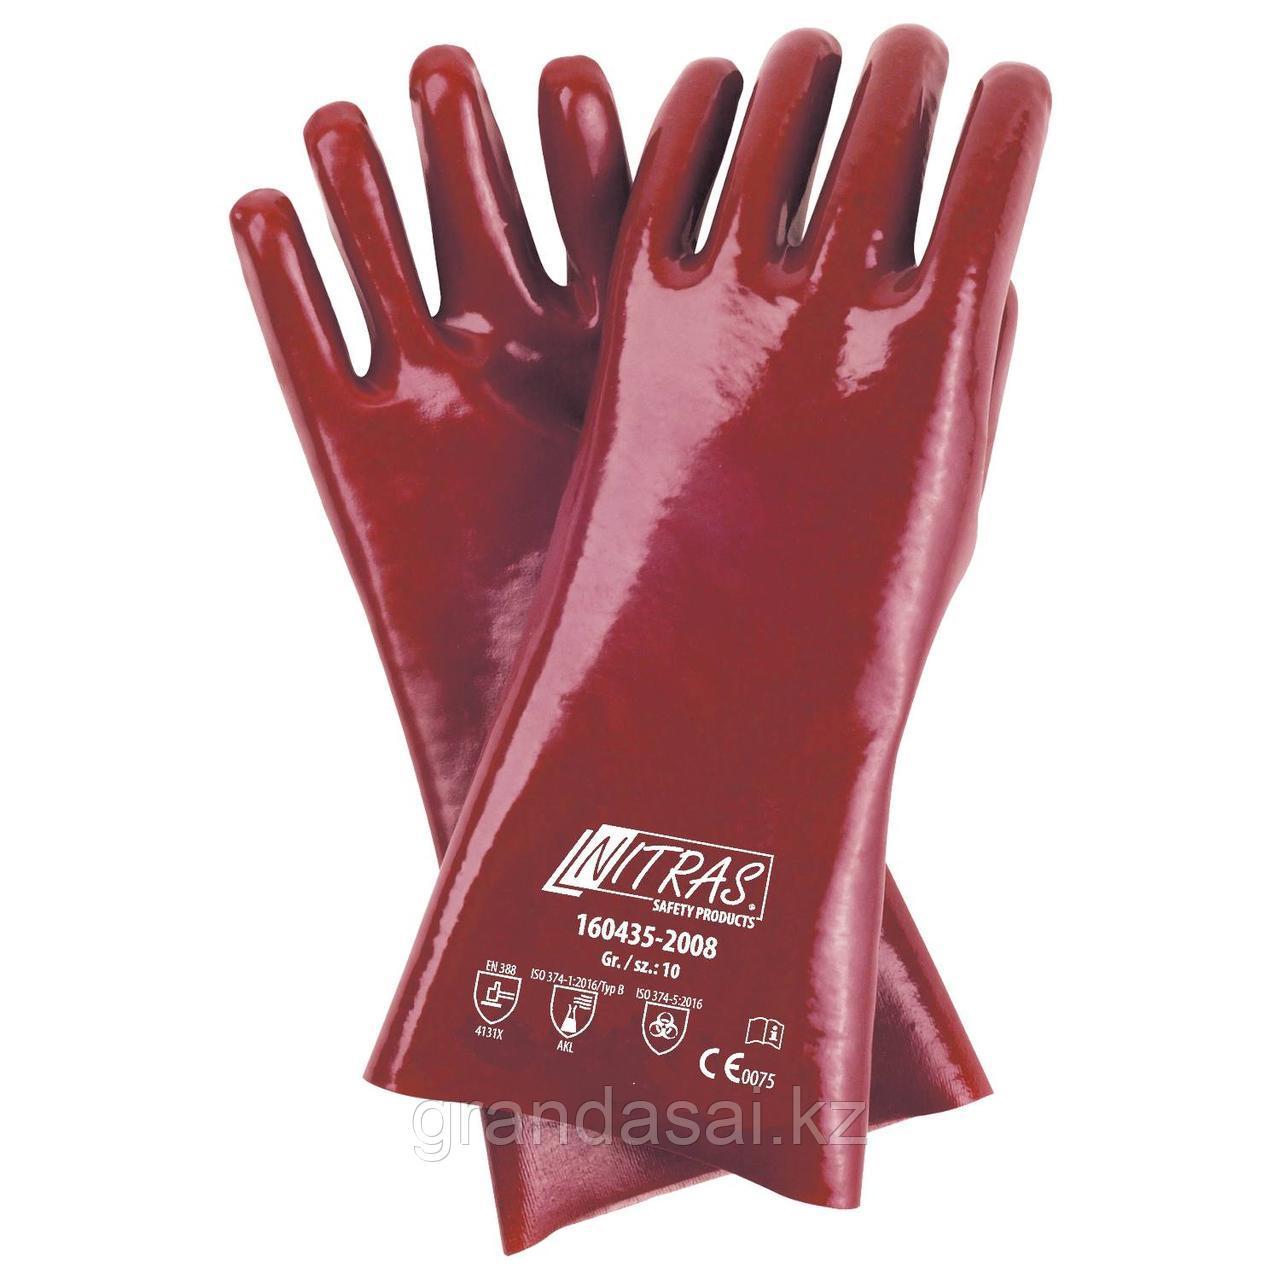 Перчатки из ПВХ NITRAS